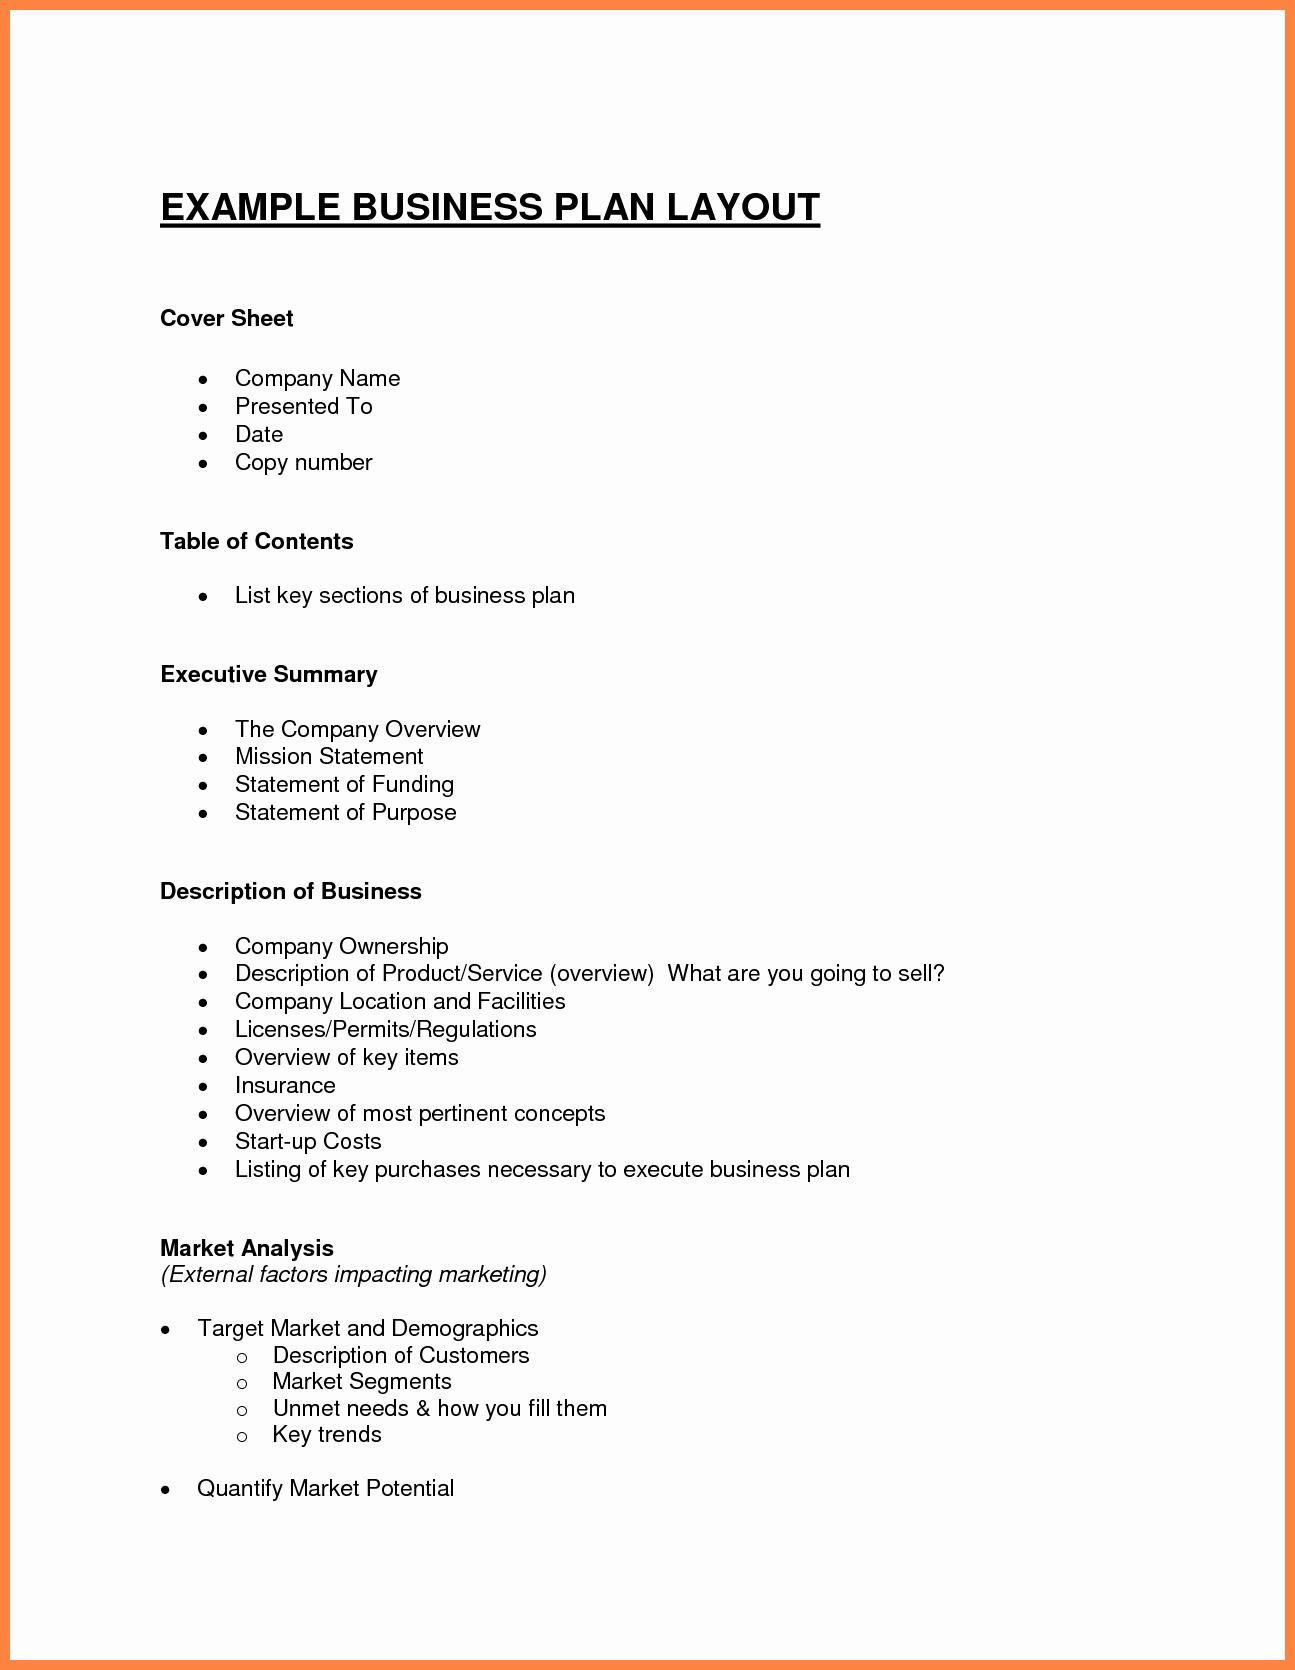 Summary Plan Description Template Inspirational Business Plan Layout